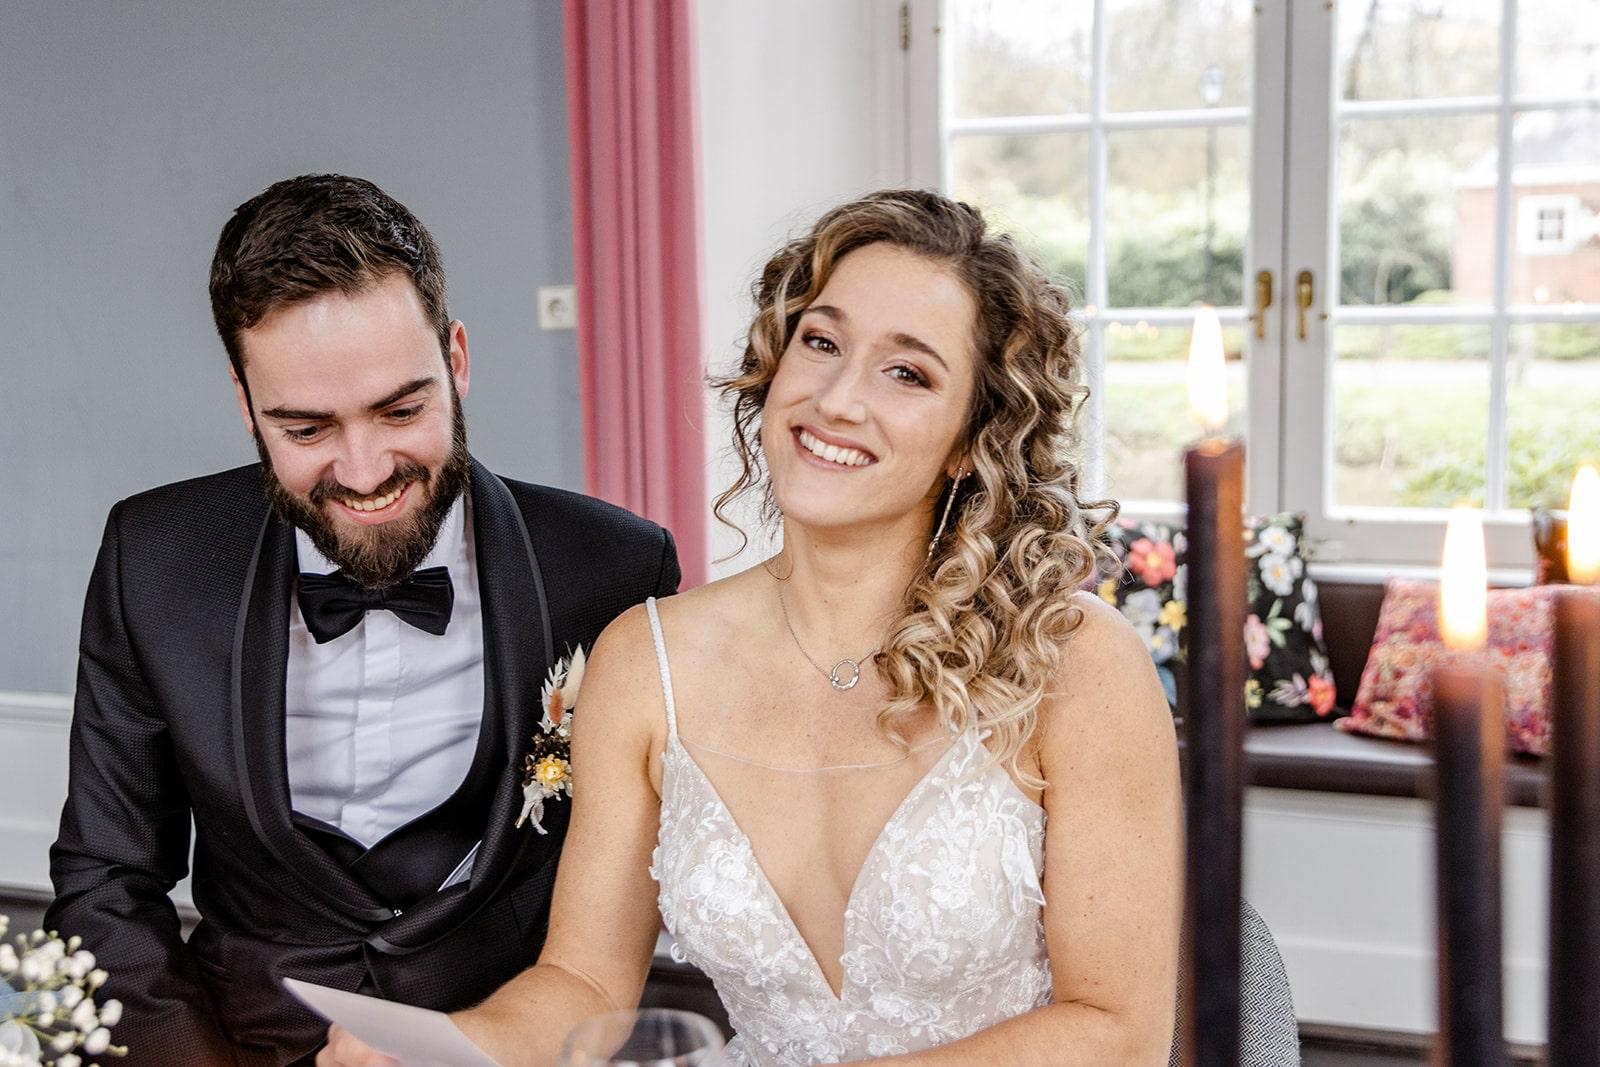 bruid en bruidegom tijdens diner met menukaart